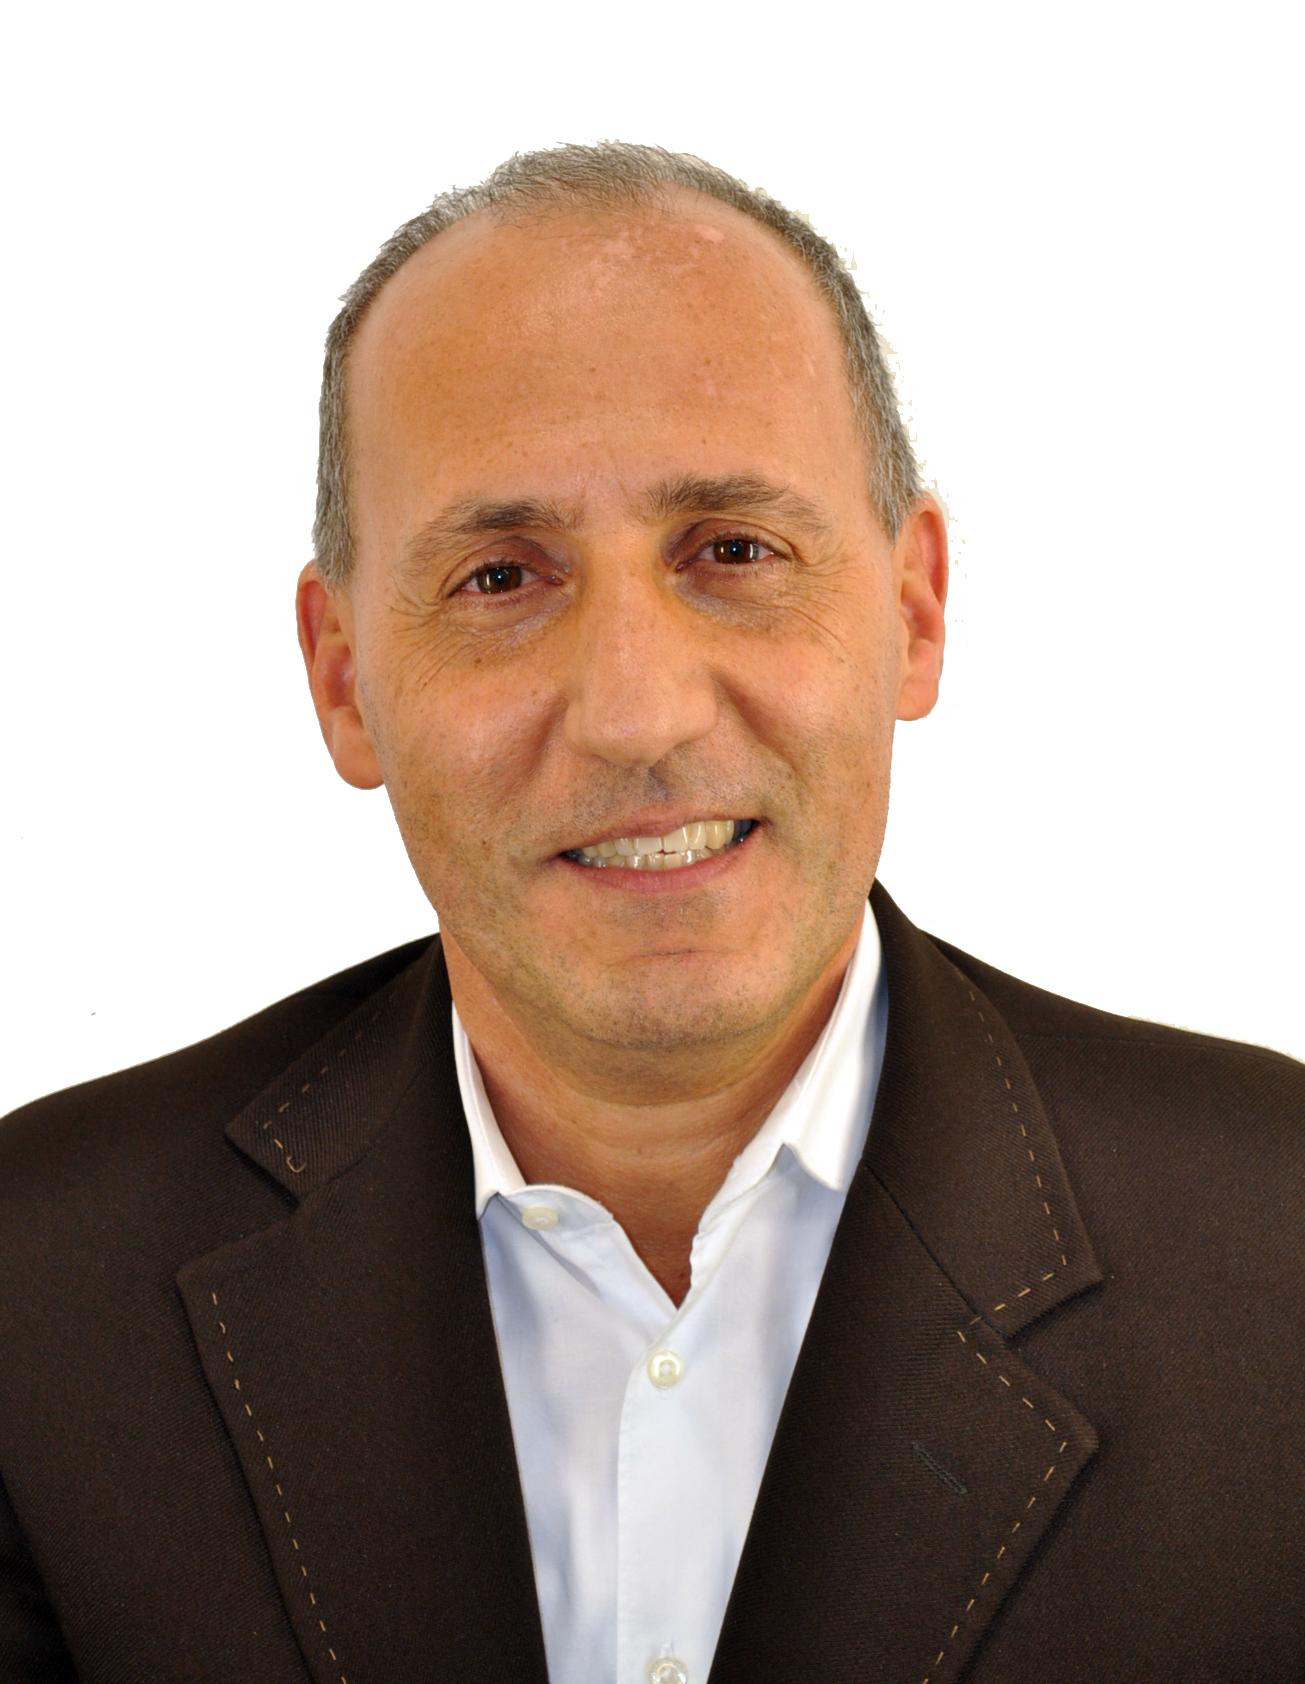 Franco Fummi, Universita' di Verona, IT